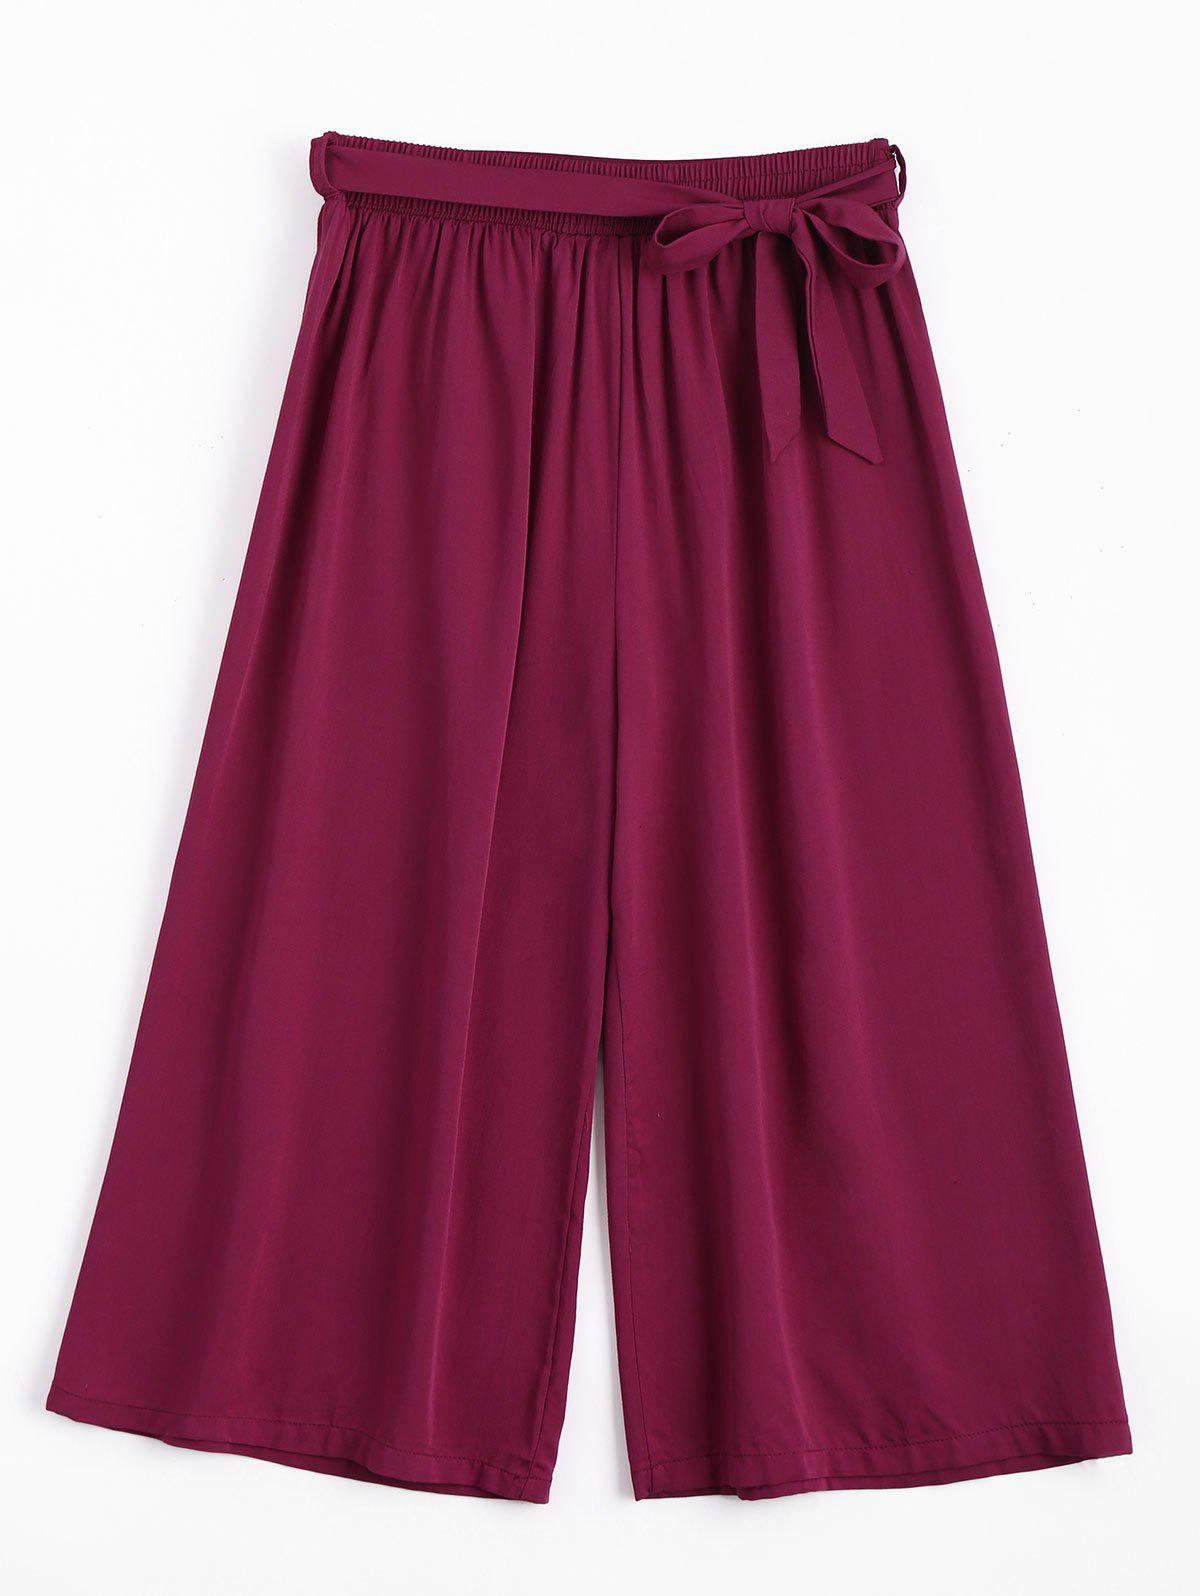 Capri High Waisted Belted Wide Leg Pants 222897201